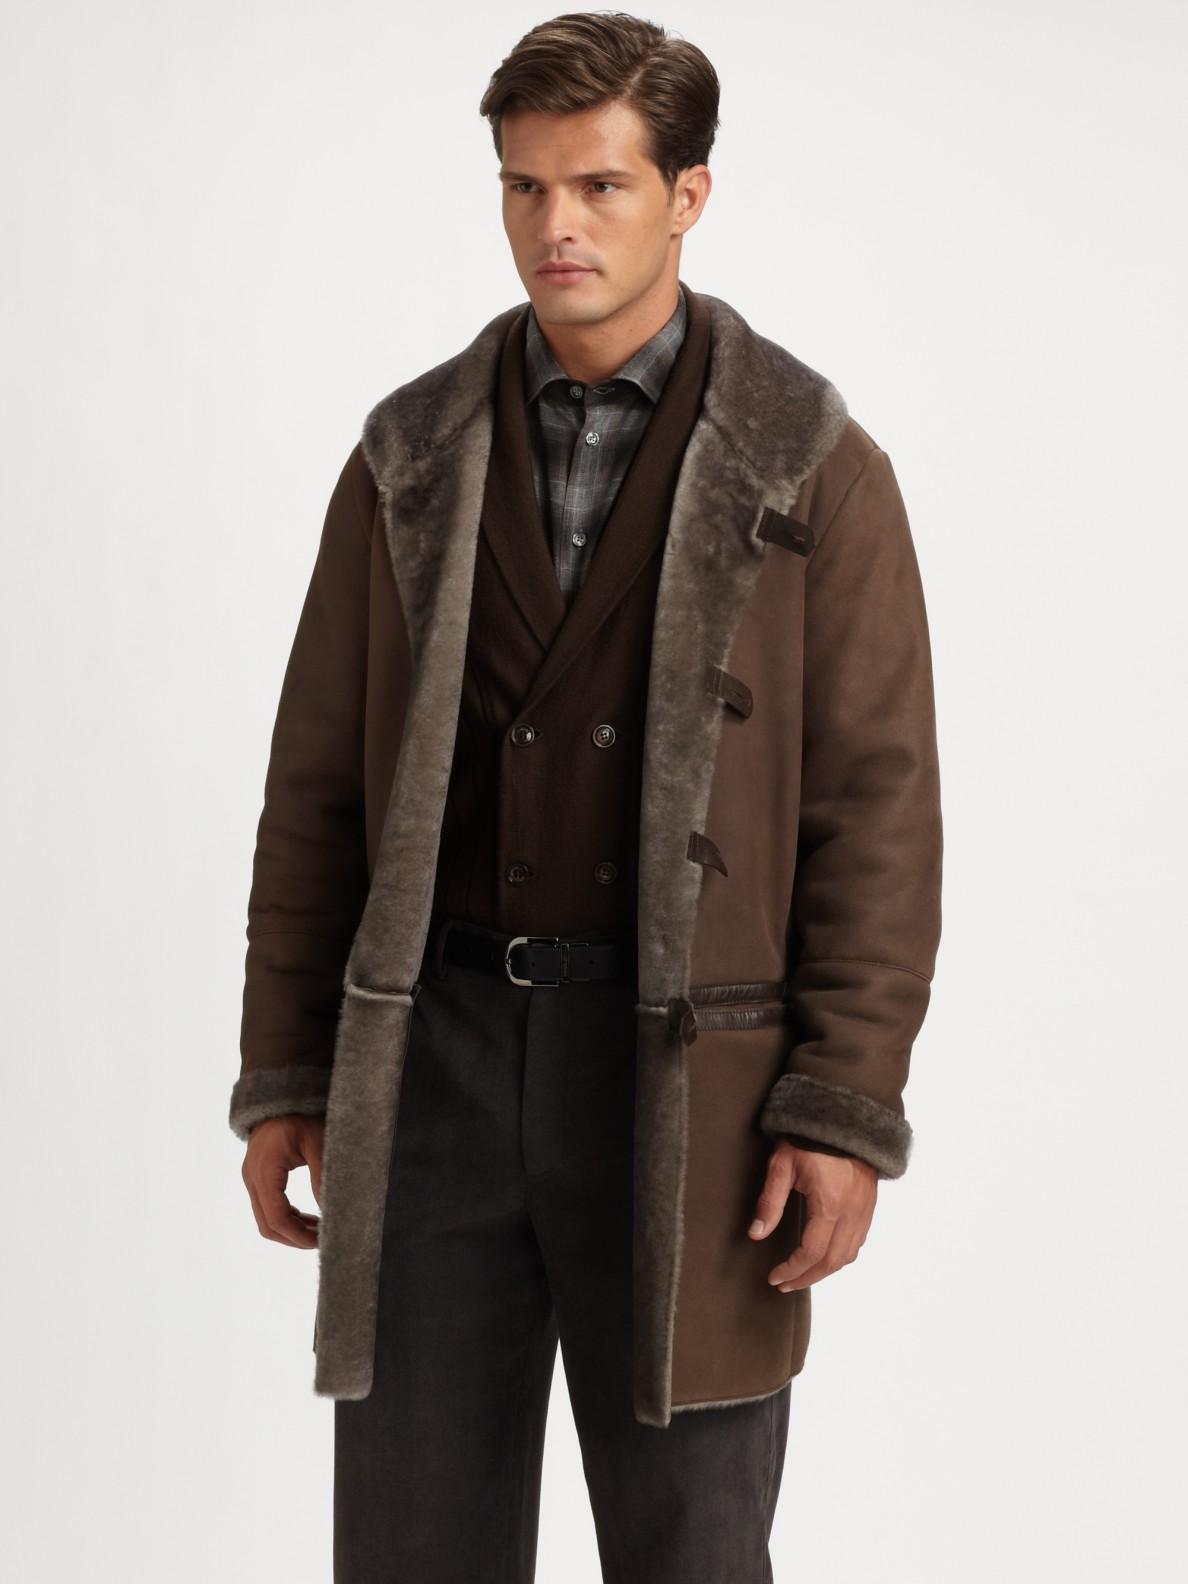 Armani Long Shearling Coat in Brown for Men | Lyst